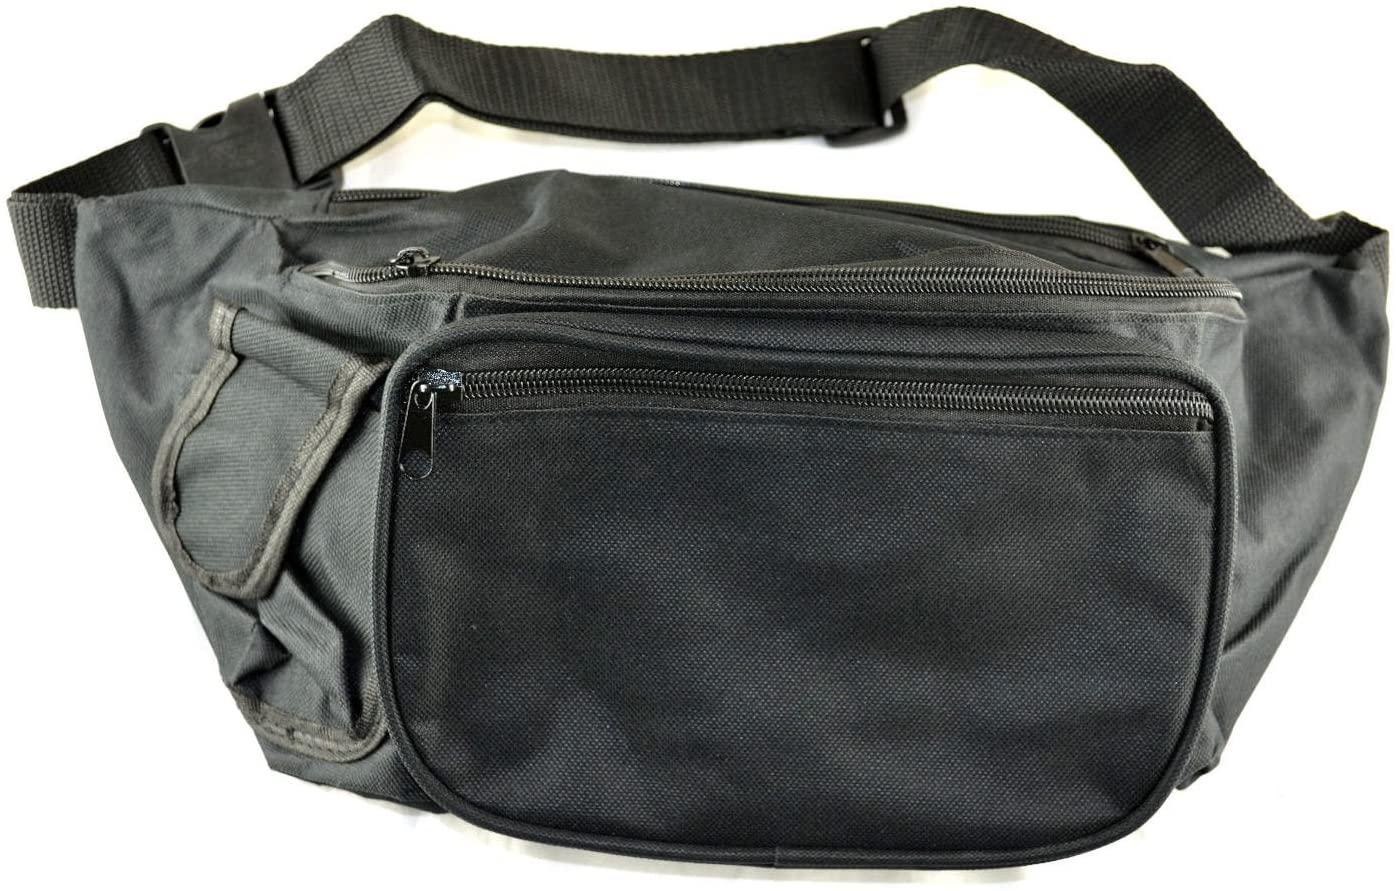 Black Fanny Pack Traveller Waist Bag